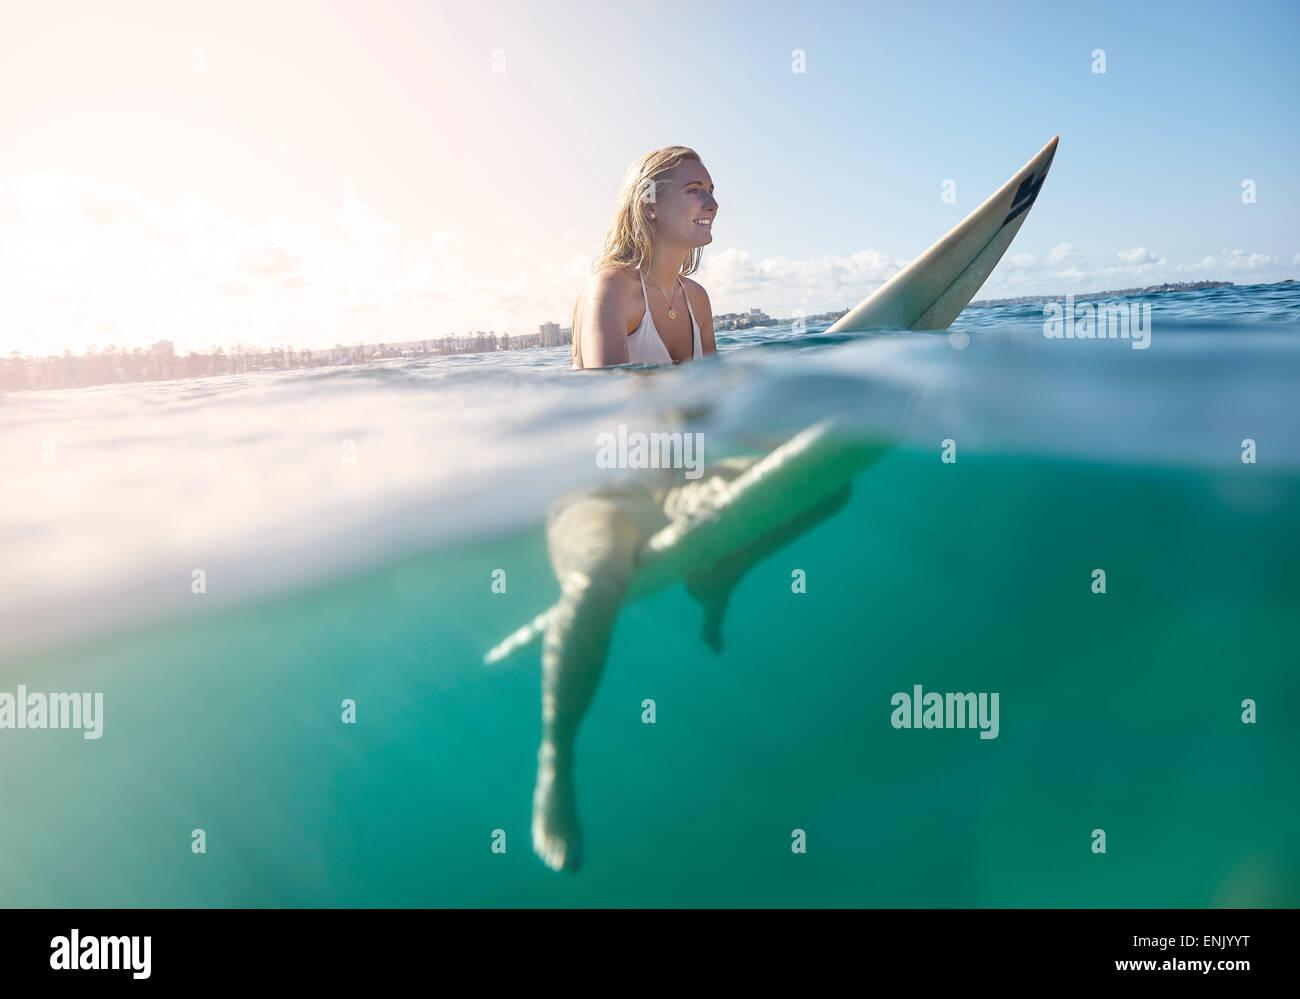 Mädchen auf Surfbrett, New South Wales, Australien, Pazifik Stockbild